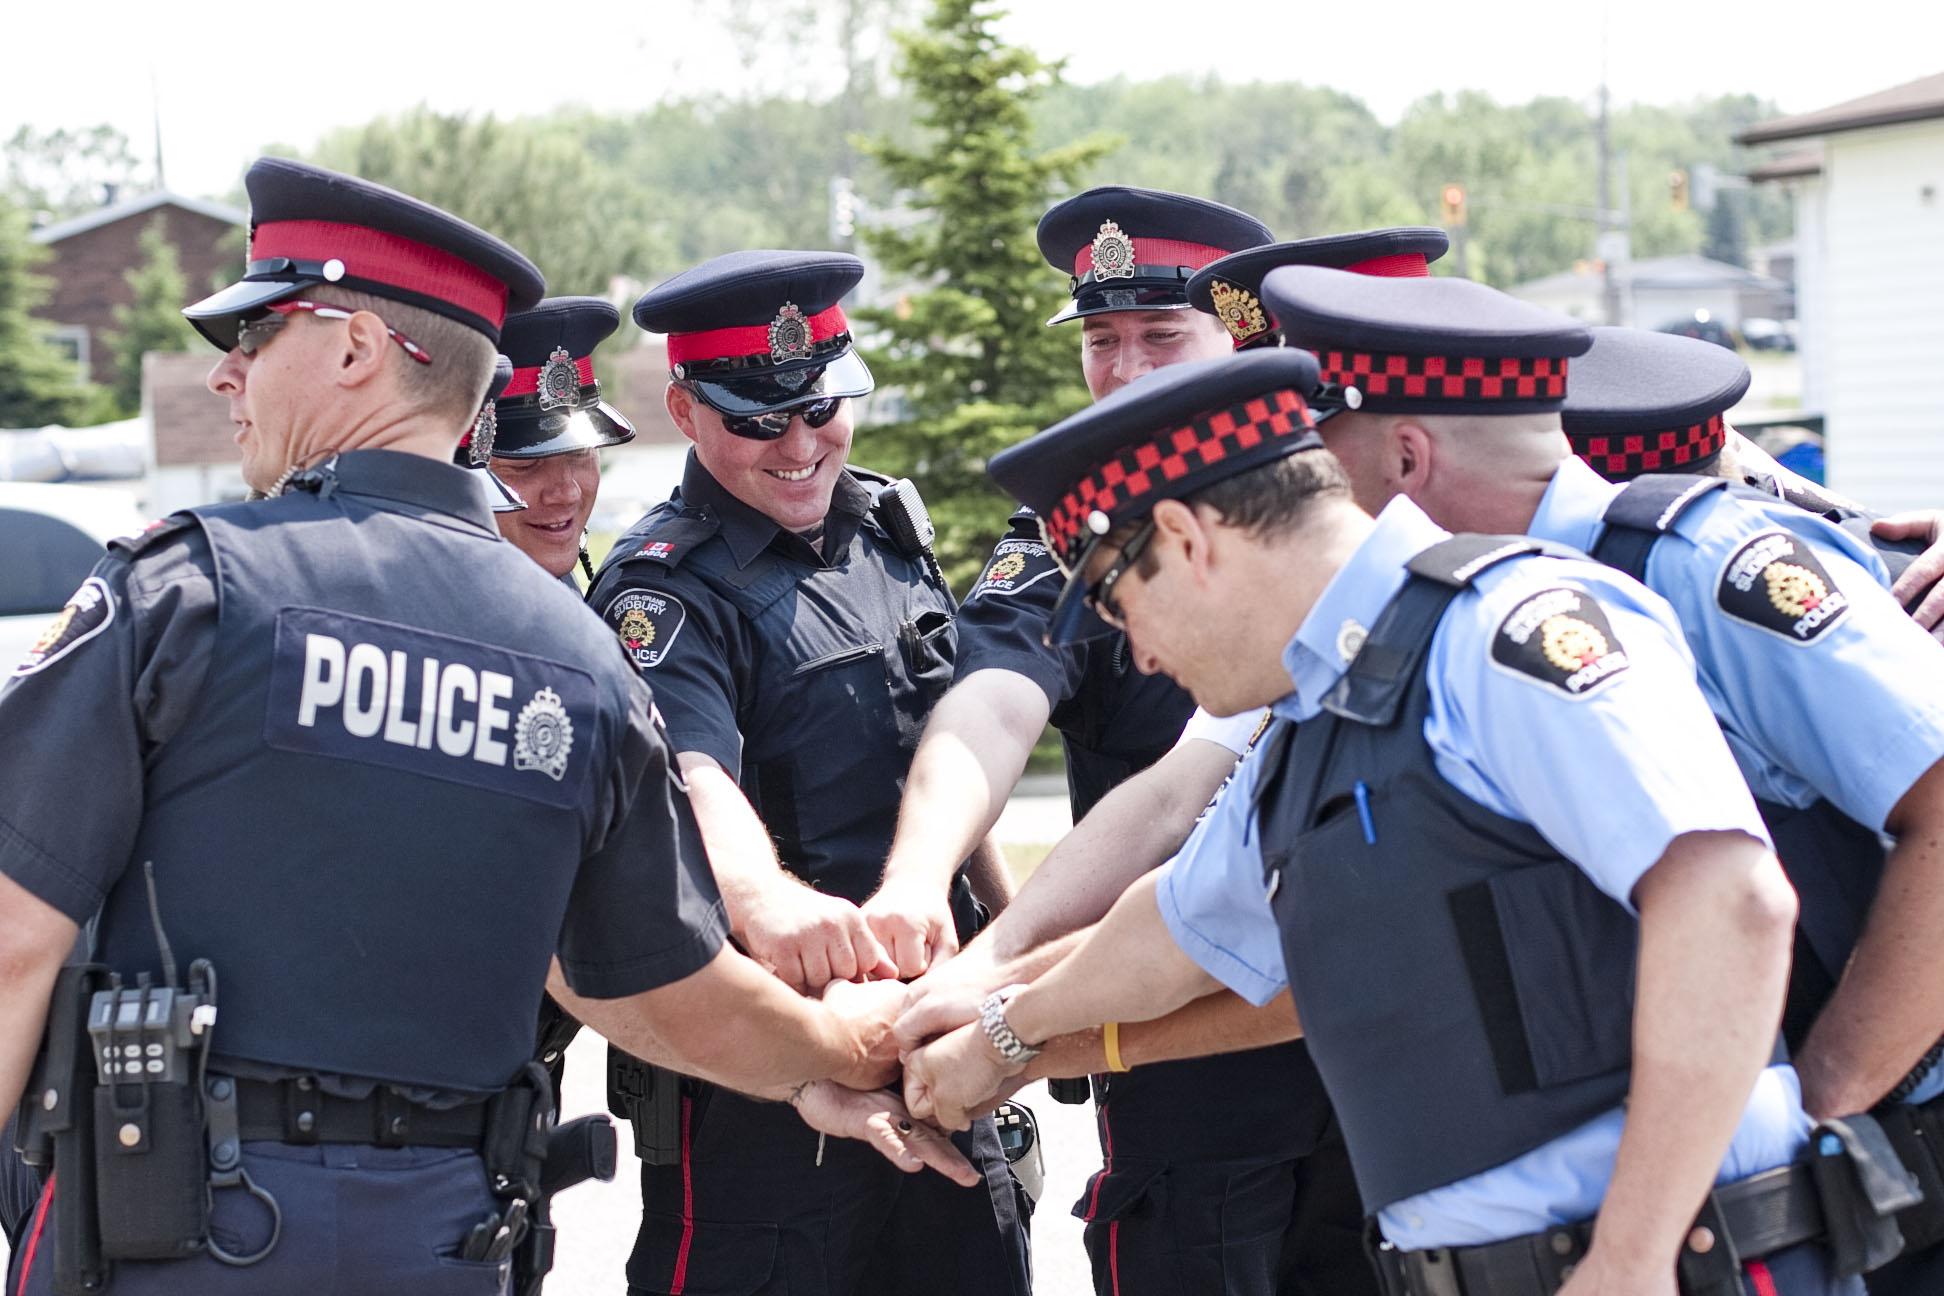 911 Pro Inc Police